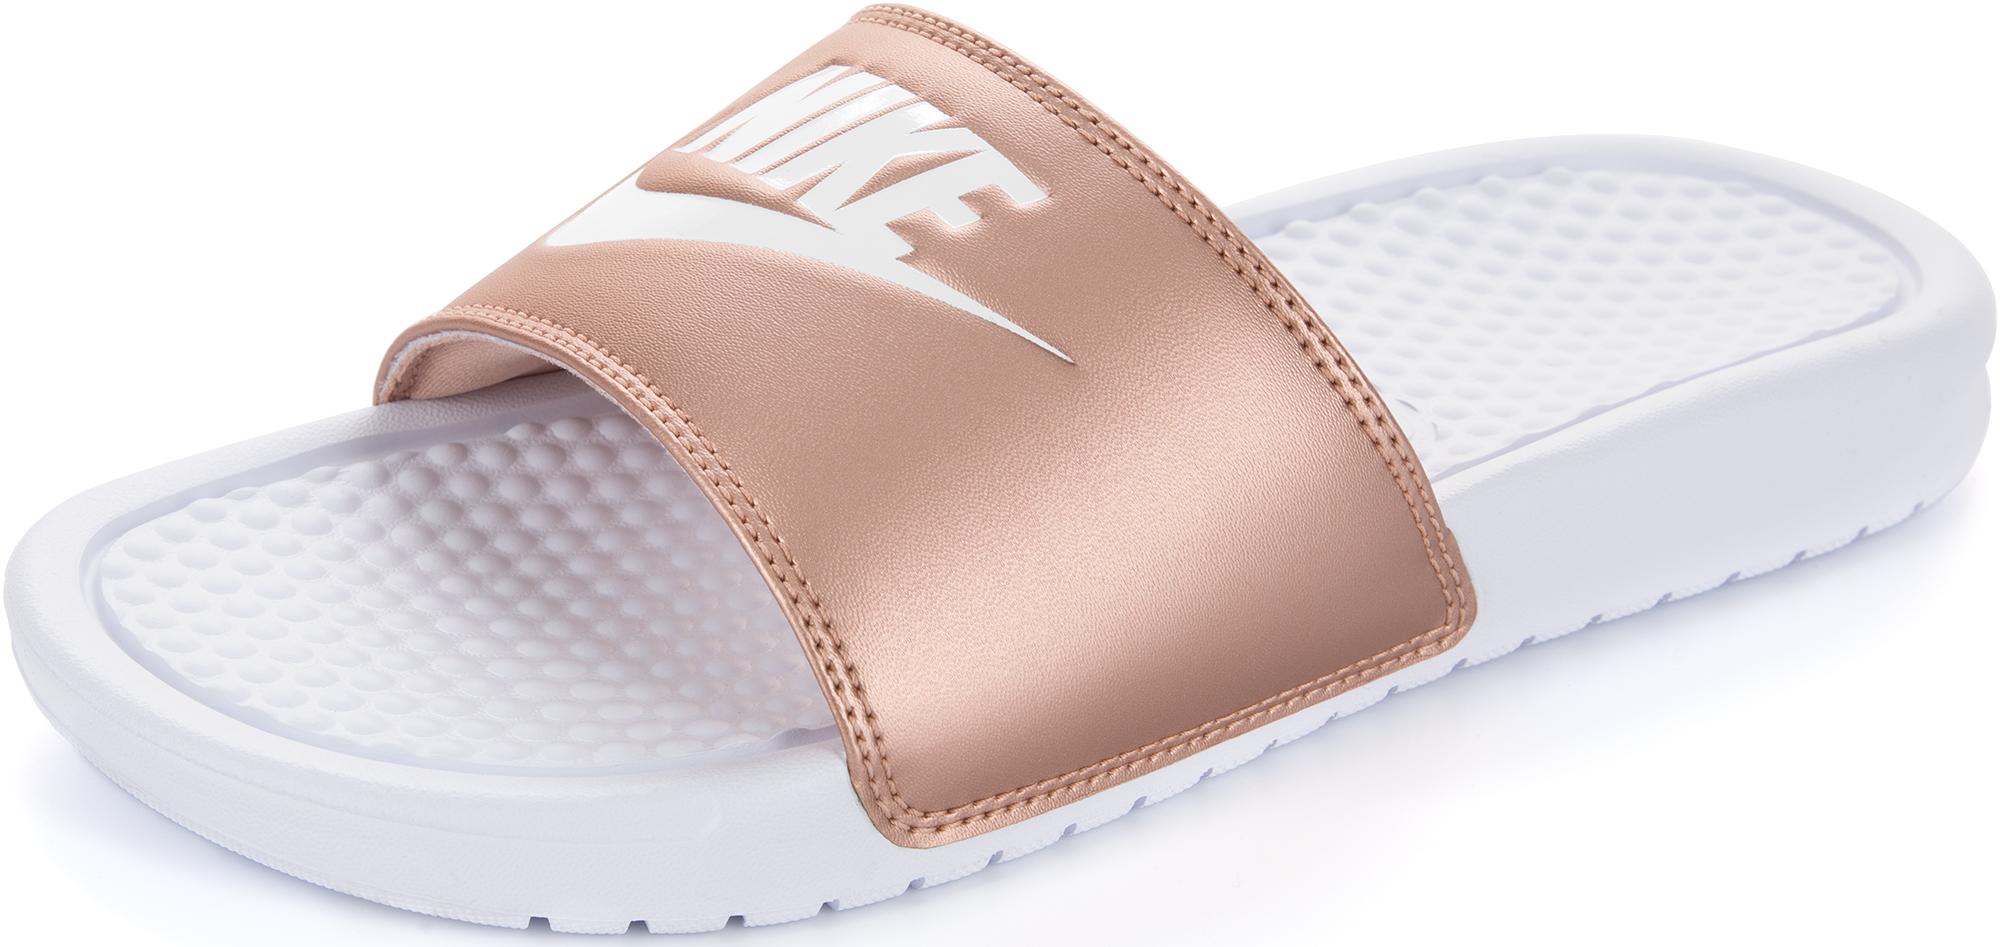 Nike Шлепанцы женские Benassi Jdi, размер 39,5